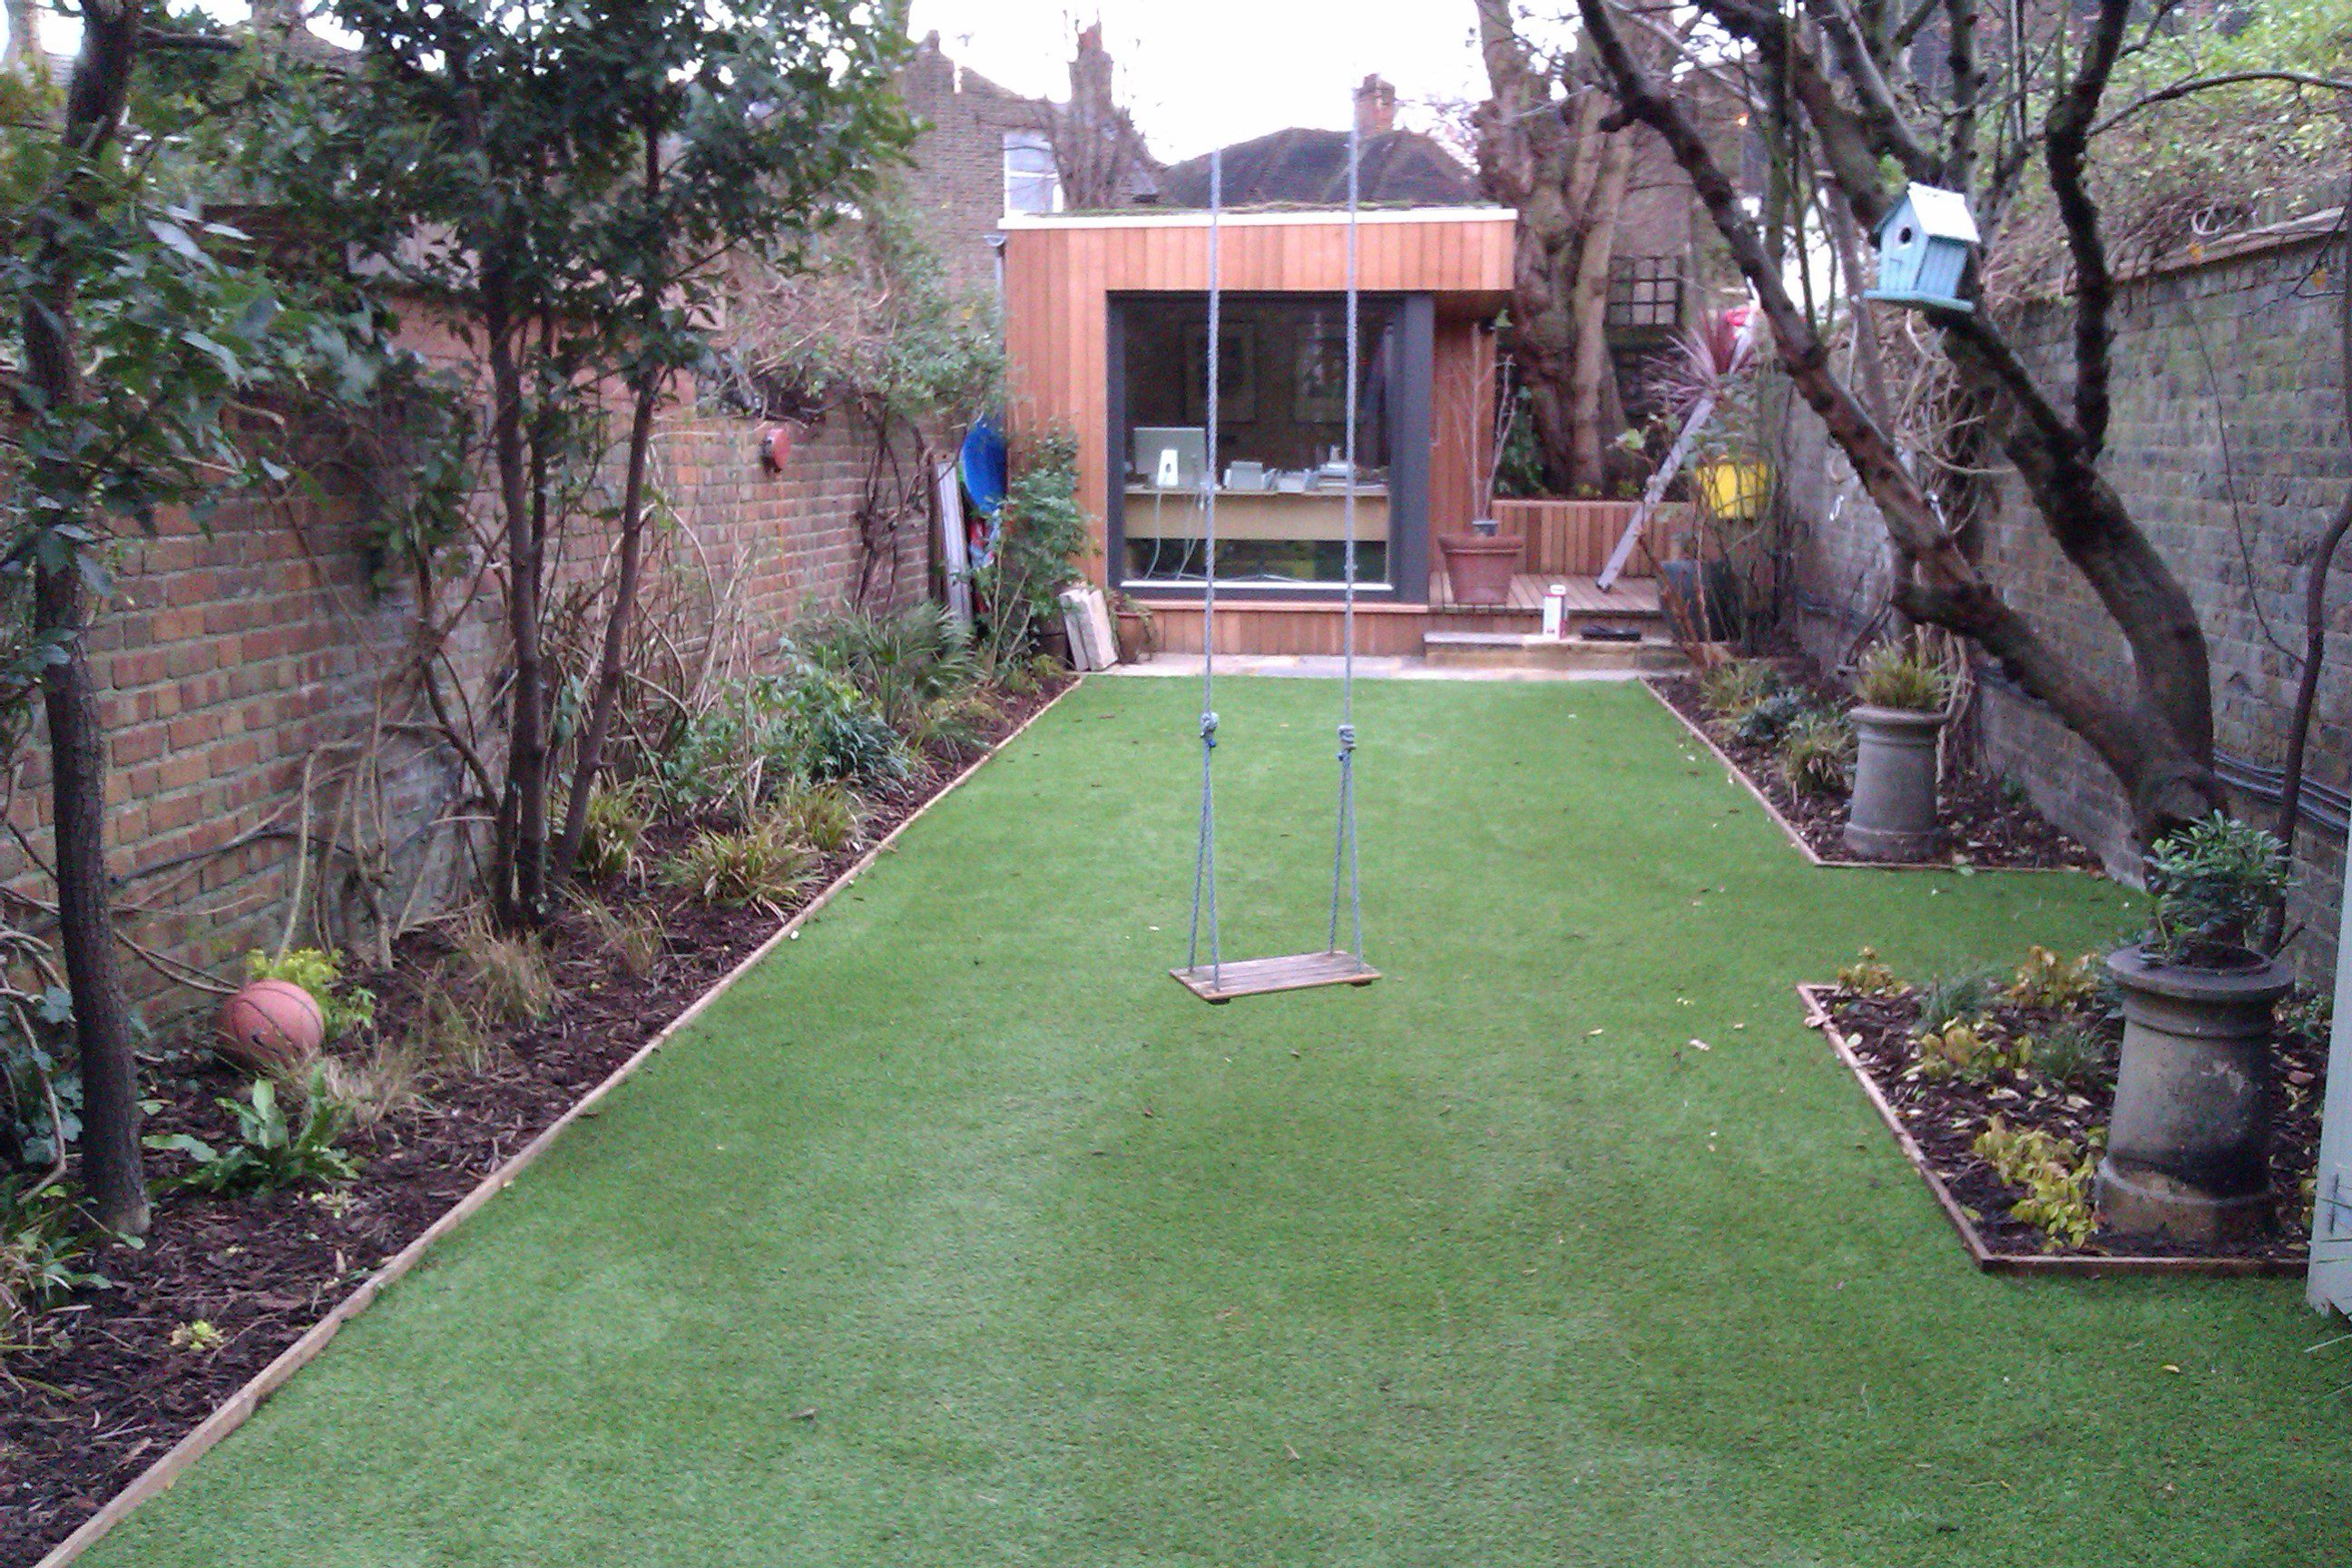 Garden Design Top Tips: I Fought the Lawn... - Earth ... on Patio And Grass Garden Ideas id=50207